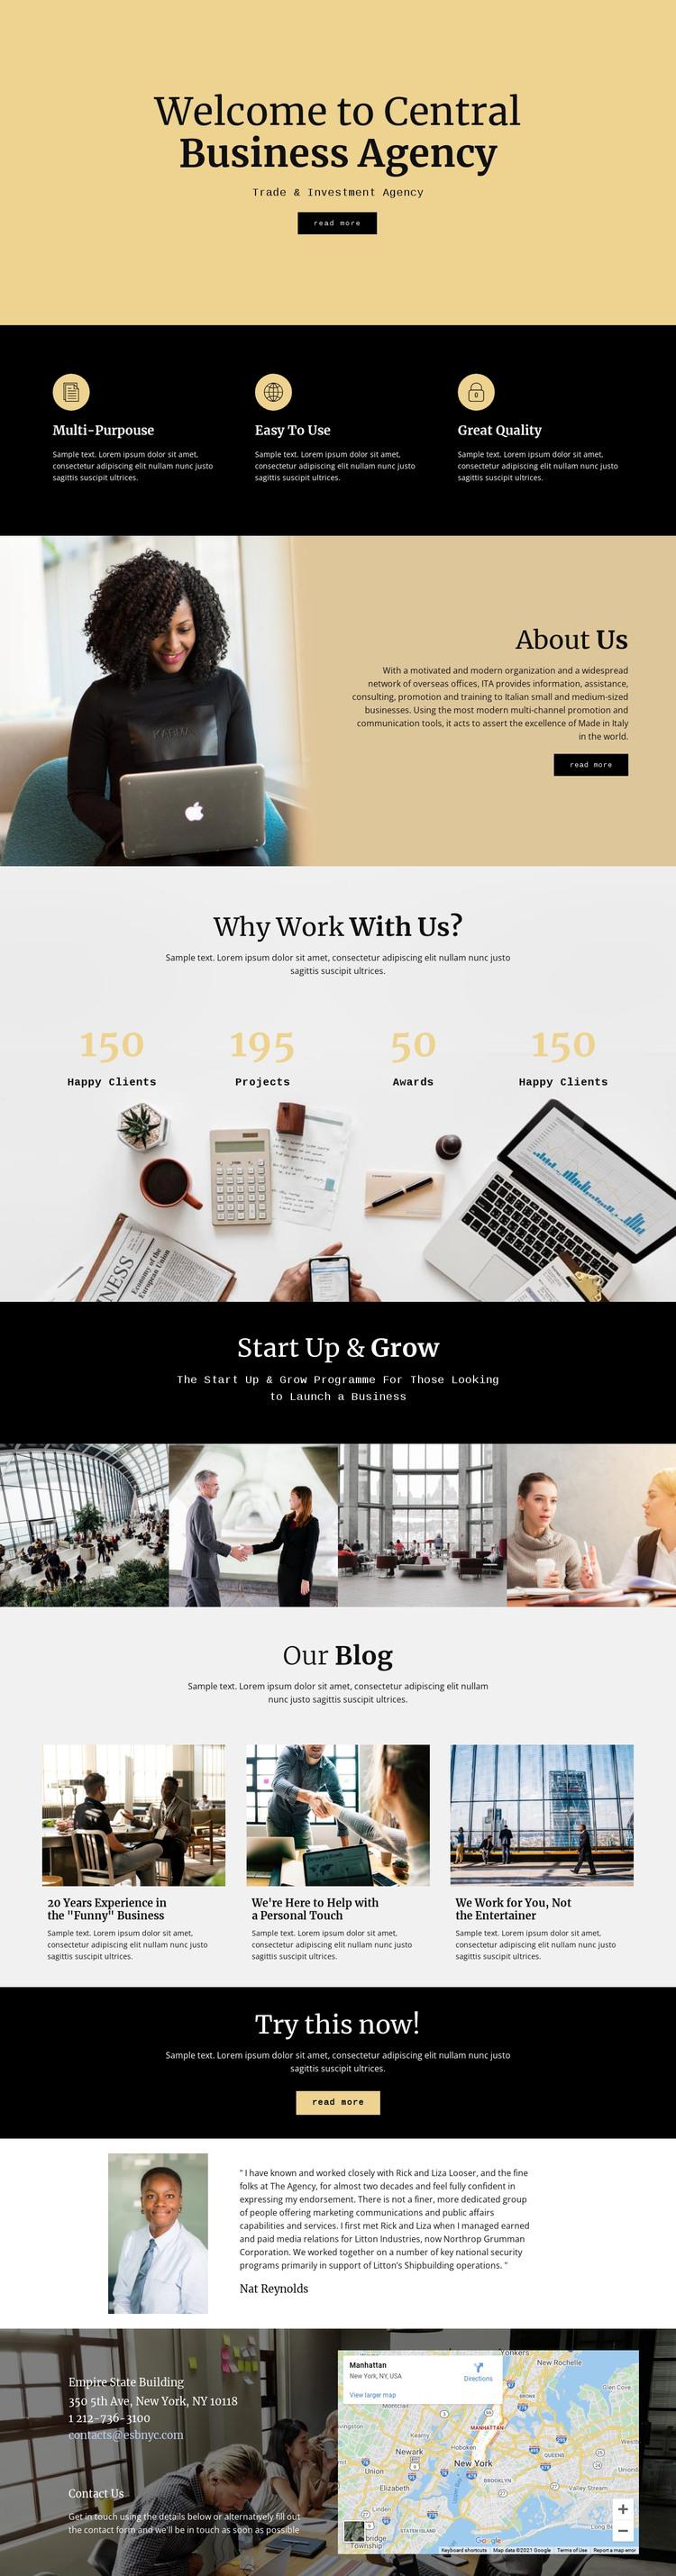 Central digital agency Web Design